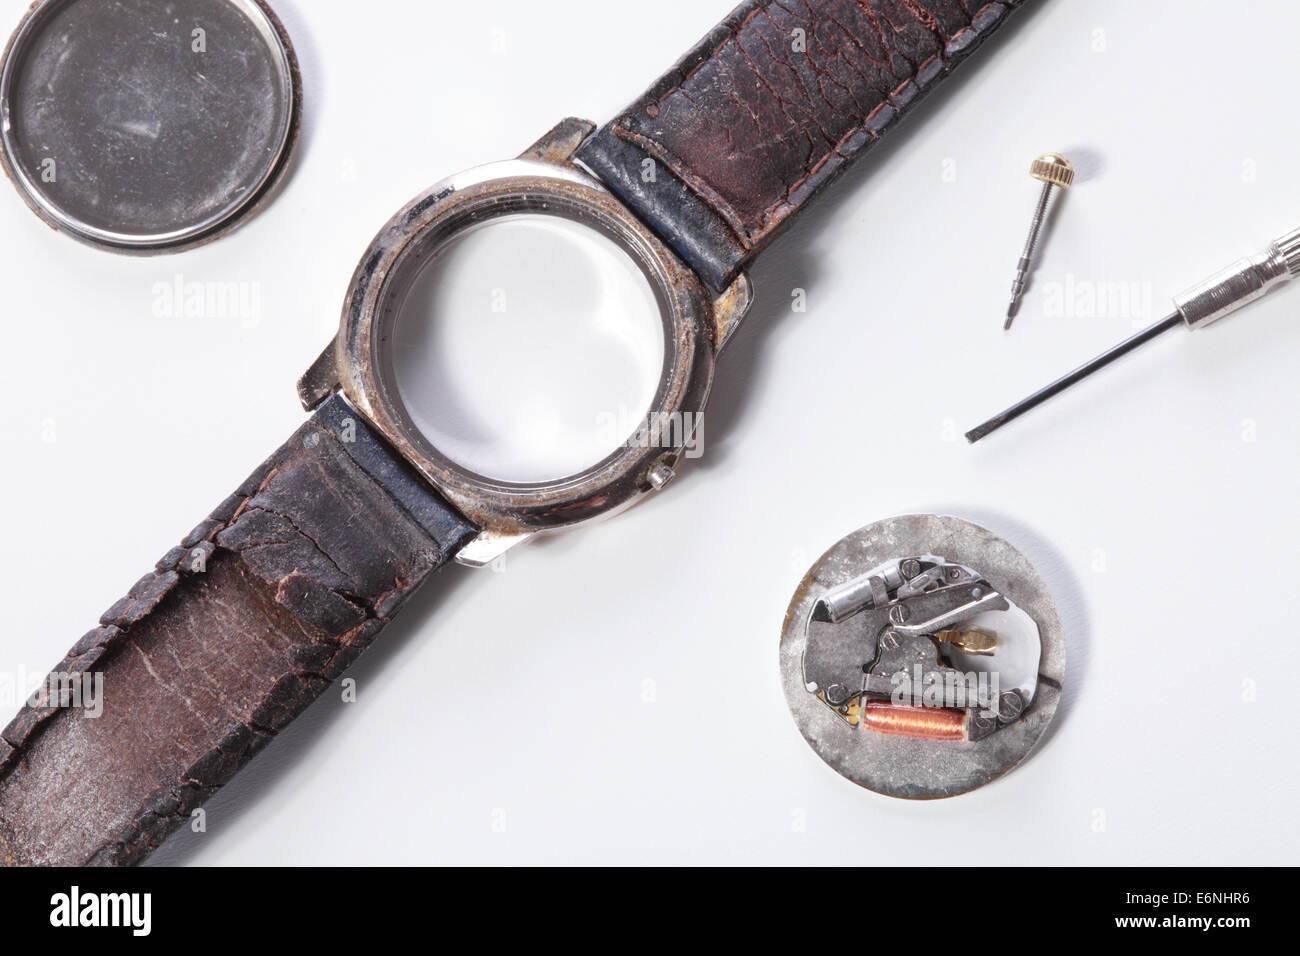 repairing an old and broken clock - Stock Image